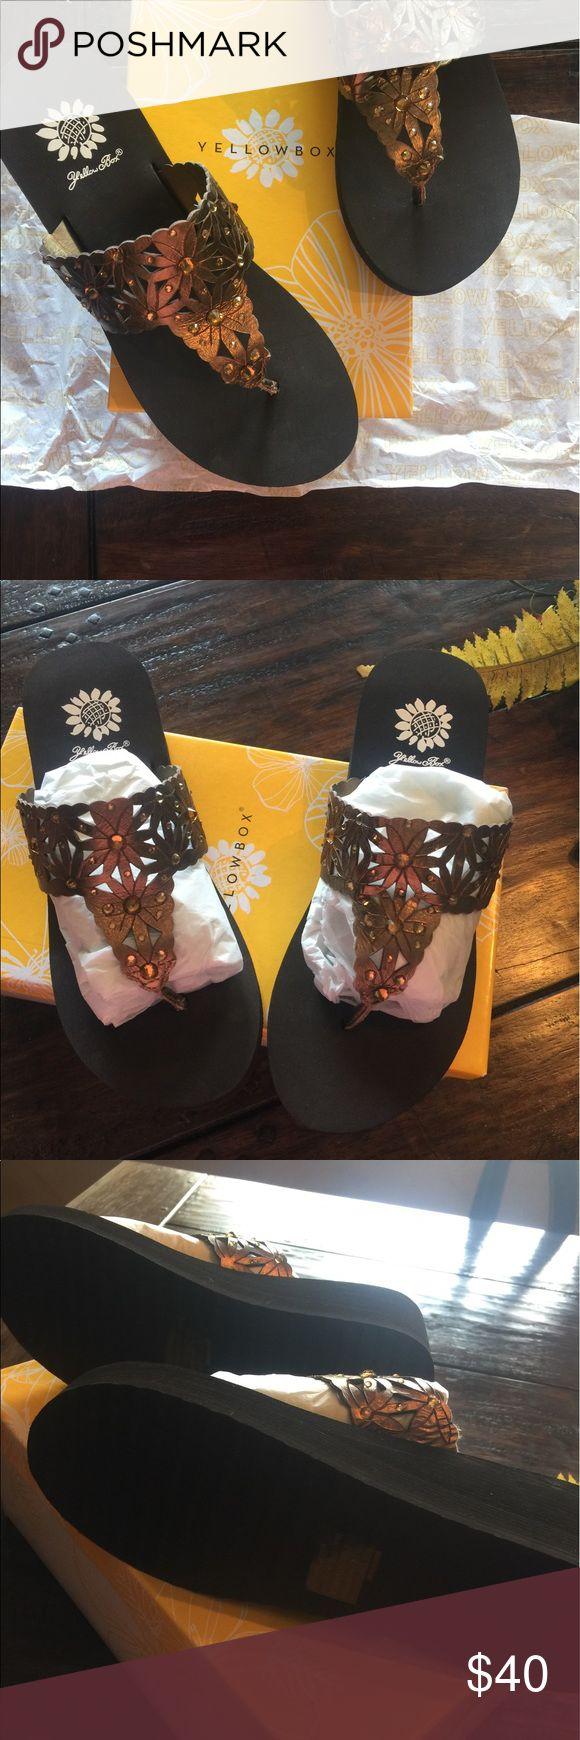 New Bronze Yellow Box Wedge Flip Flop Bronze Floral Pattern with Bronze Rhinestones.  Wedge flip flop. Yellow Box Shoes Sandals